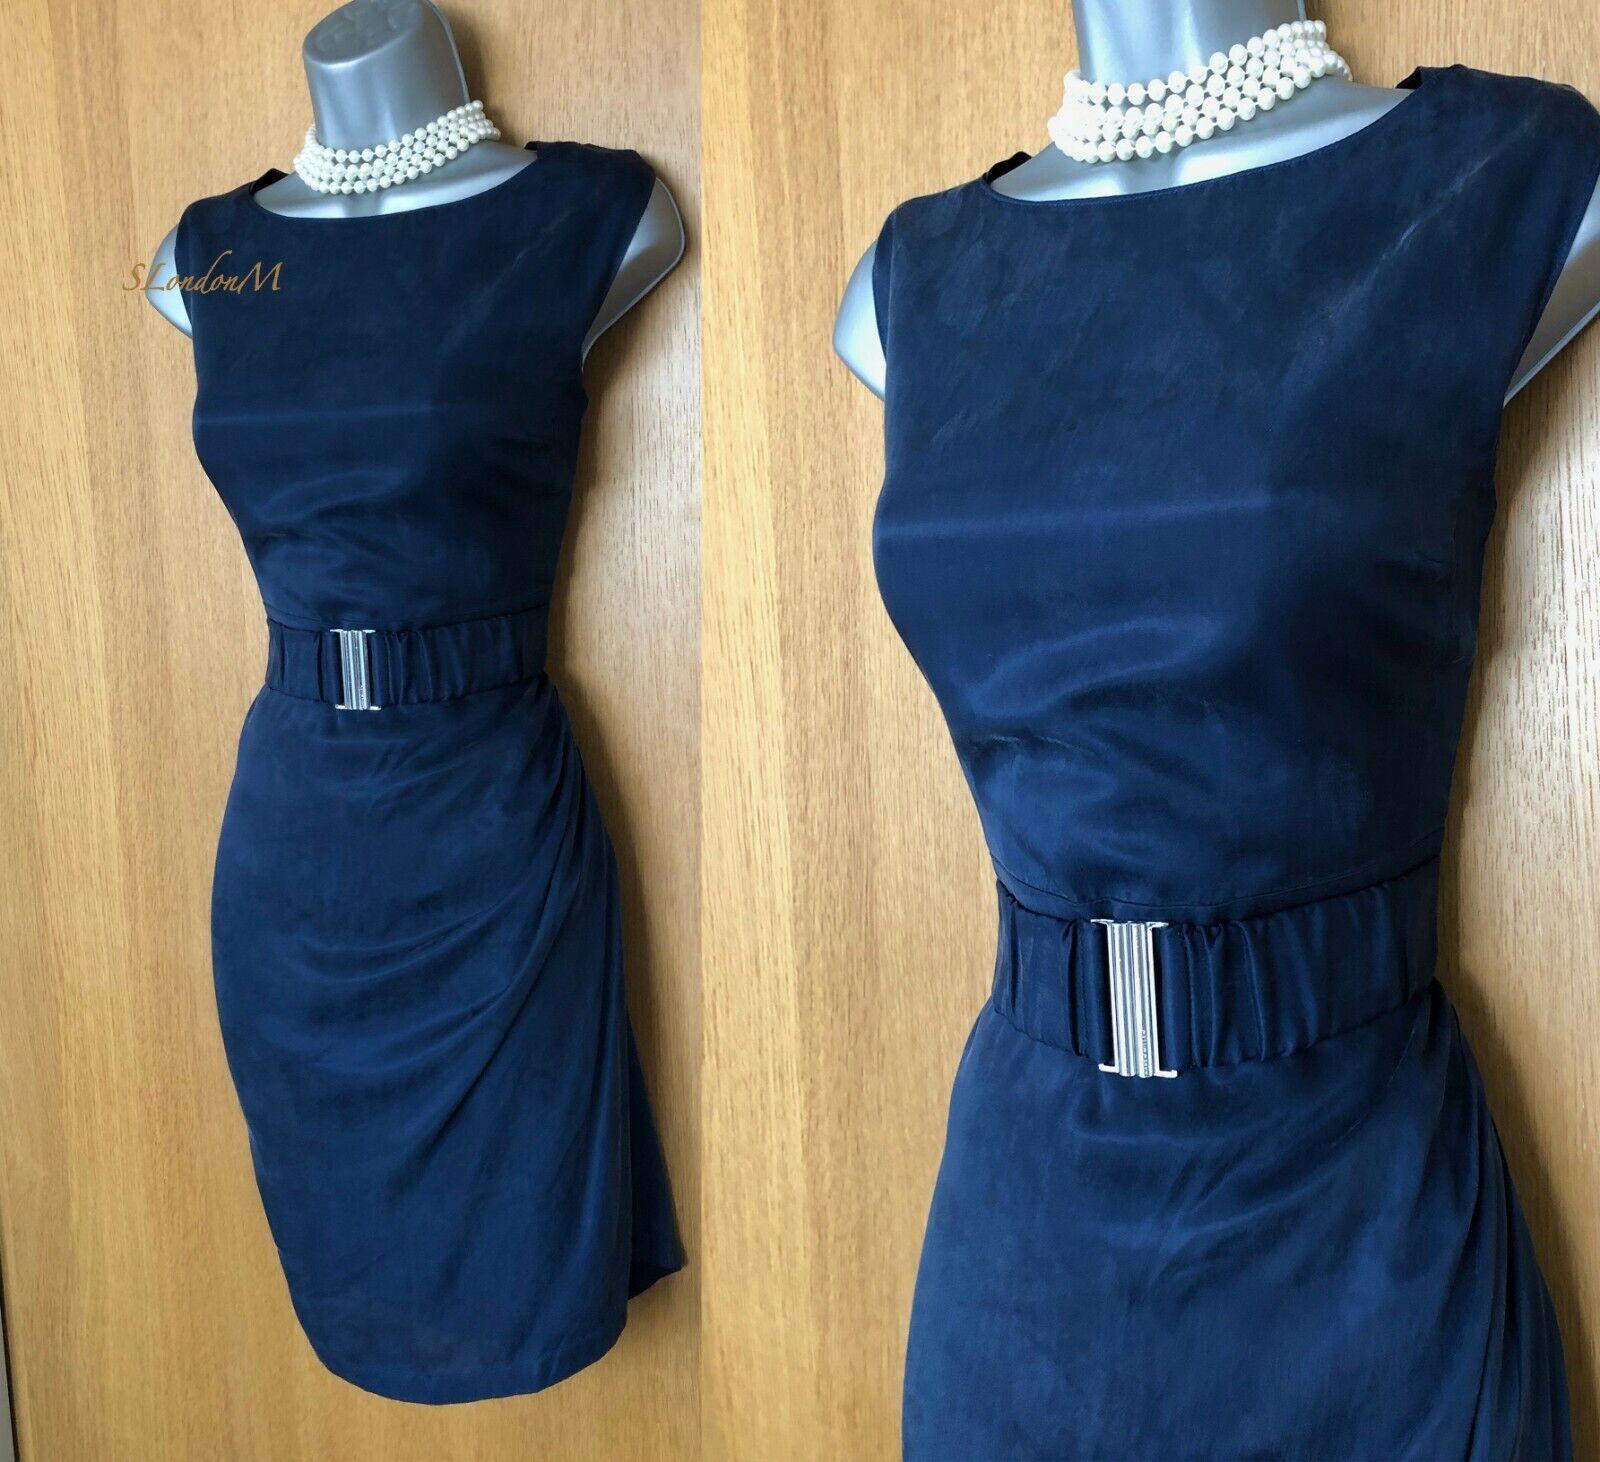 Karen Millen UK 12 Navy Cupro Frill Detail Belted Any Occasion Knee Length Dress